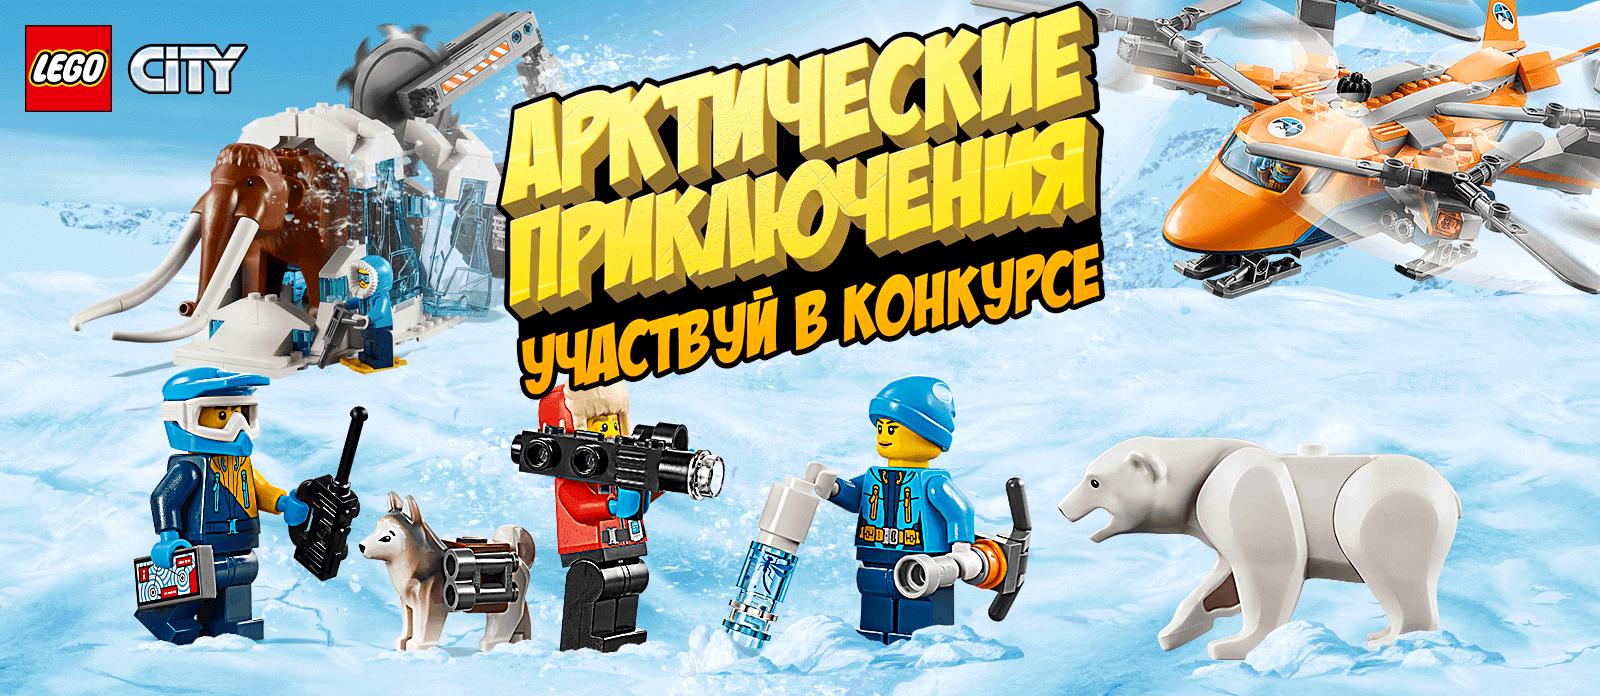 Конкурс: Арктические приключения